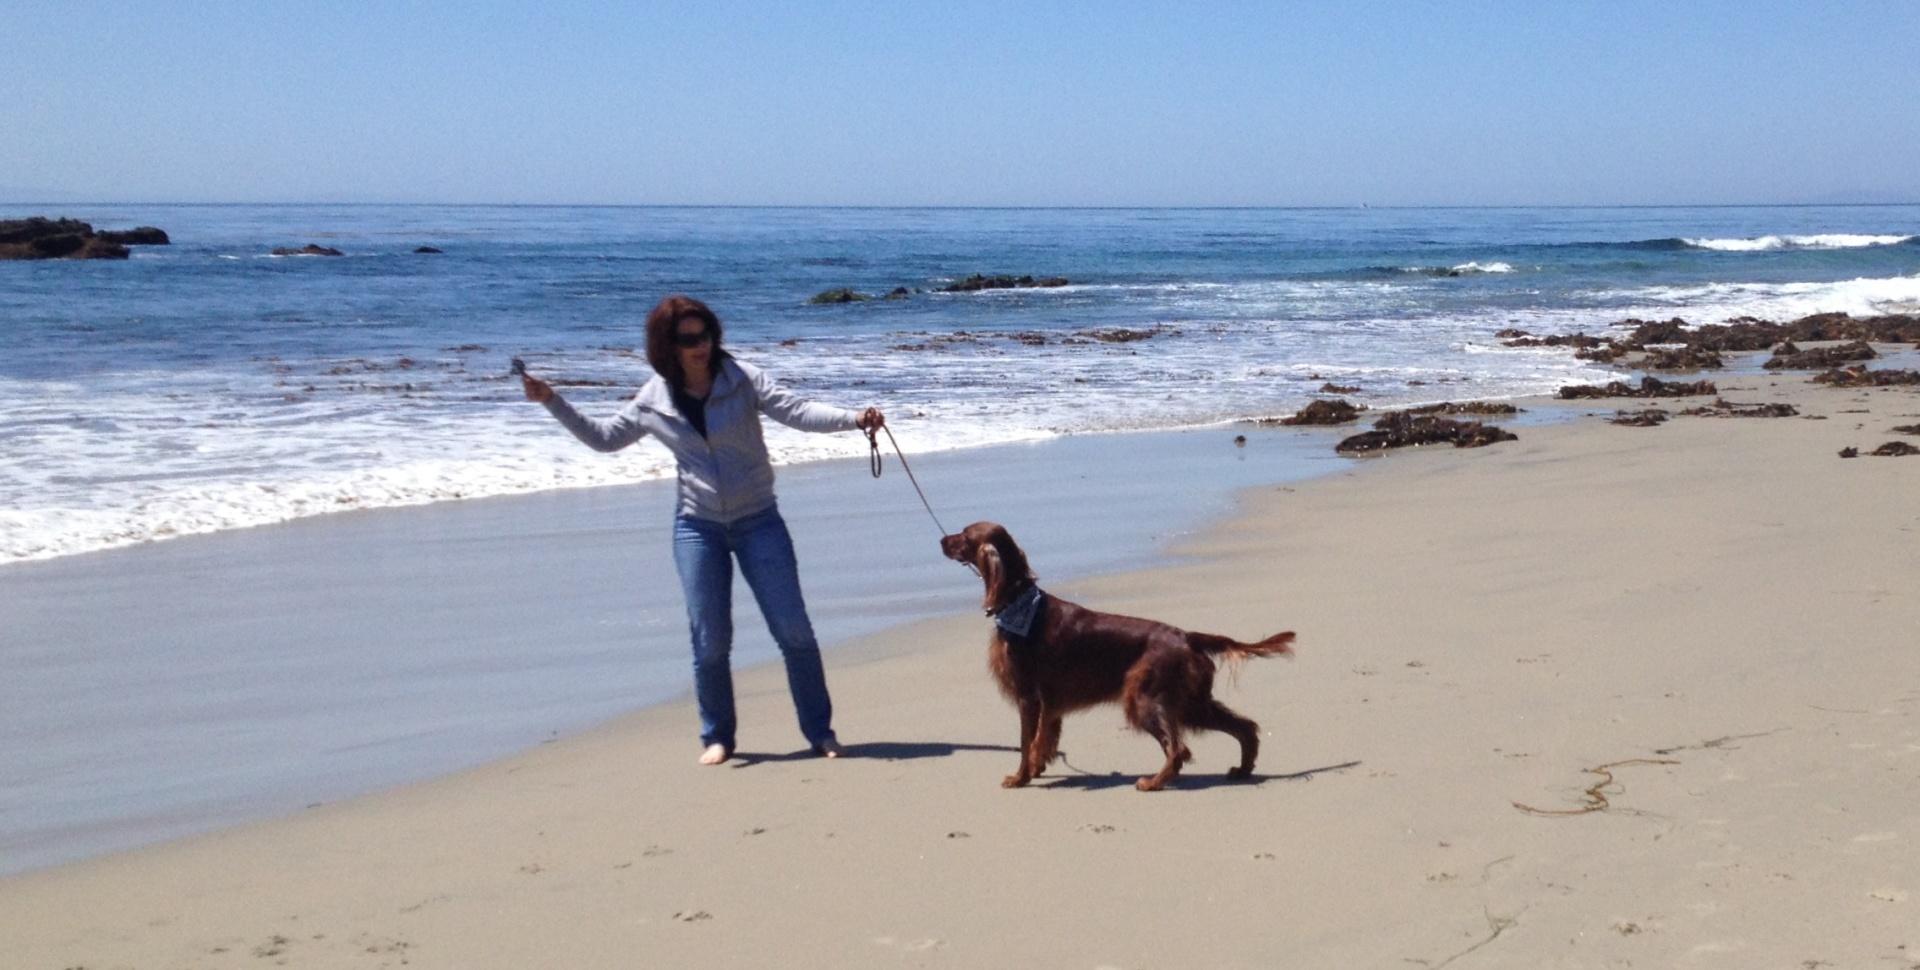 At Laguna Beach